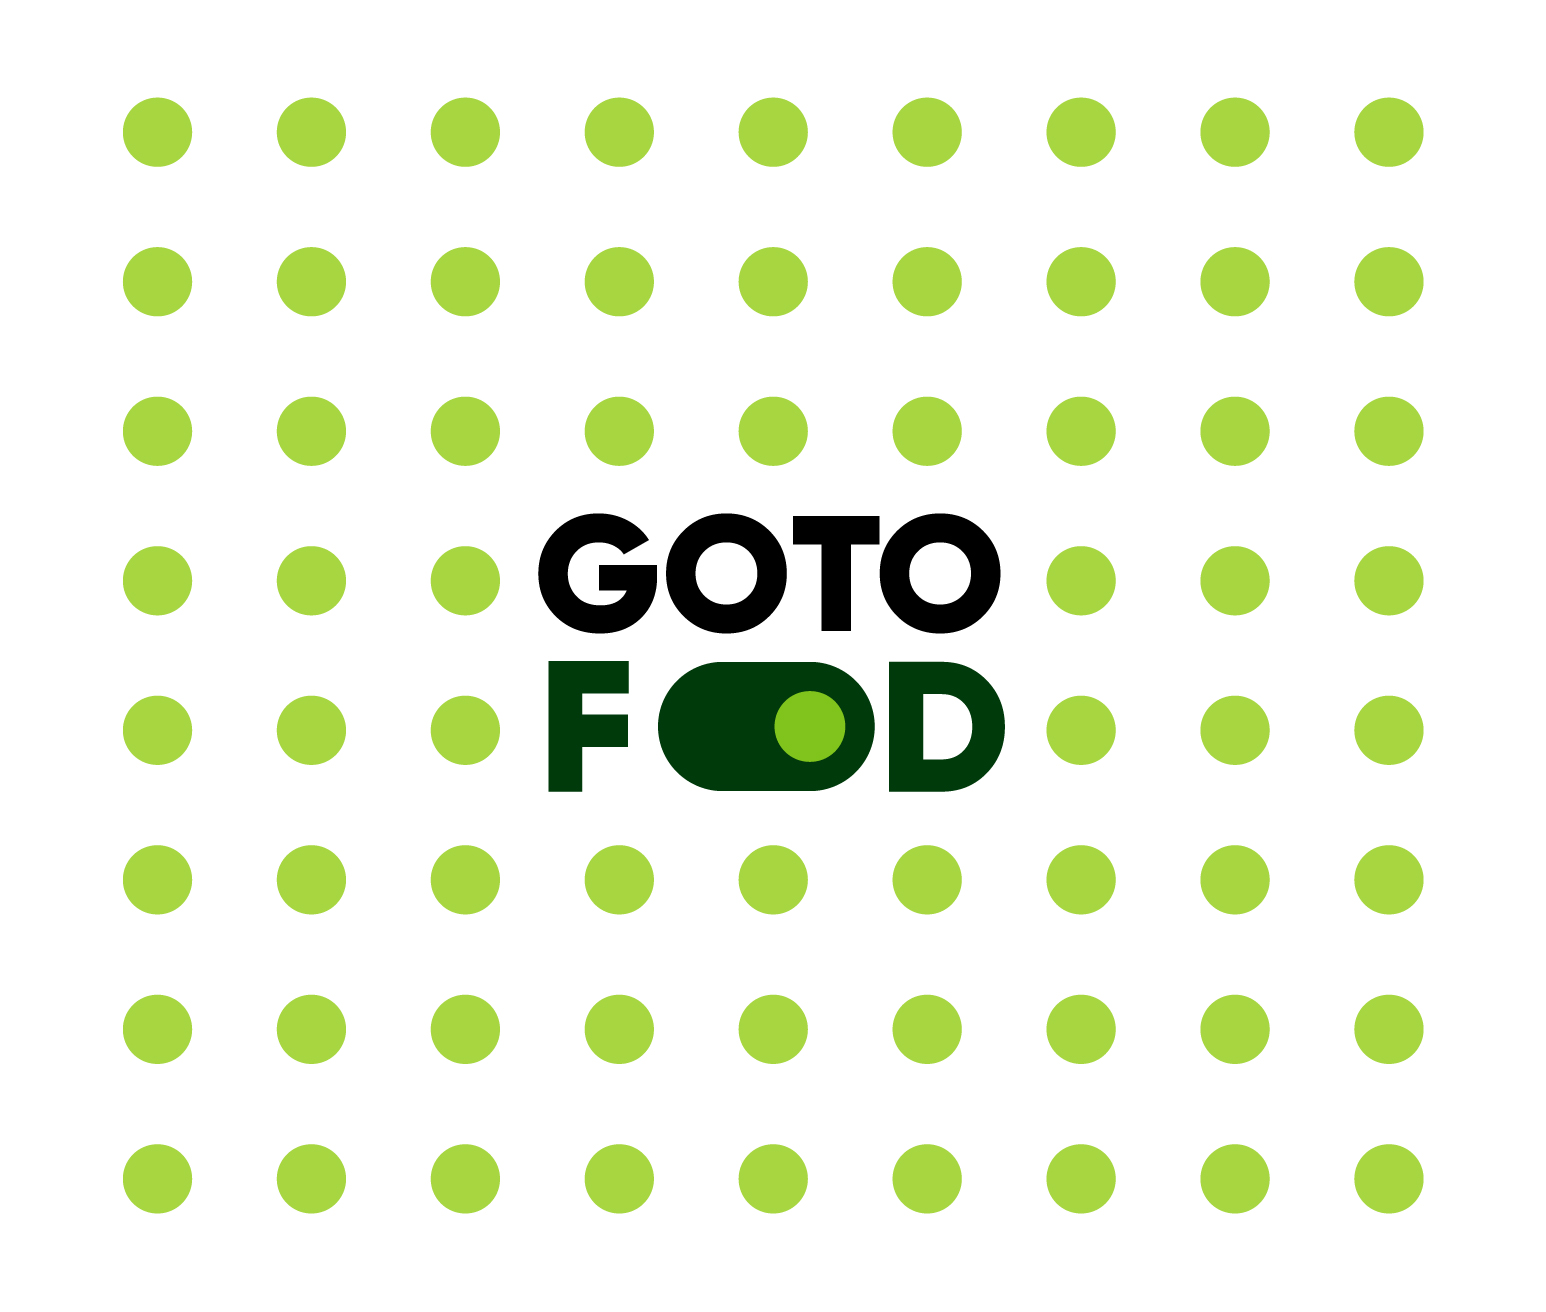 Логотип интернет-магазина здоровой еды фото f_2365cd4723fa5b03.jpg